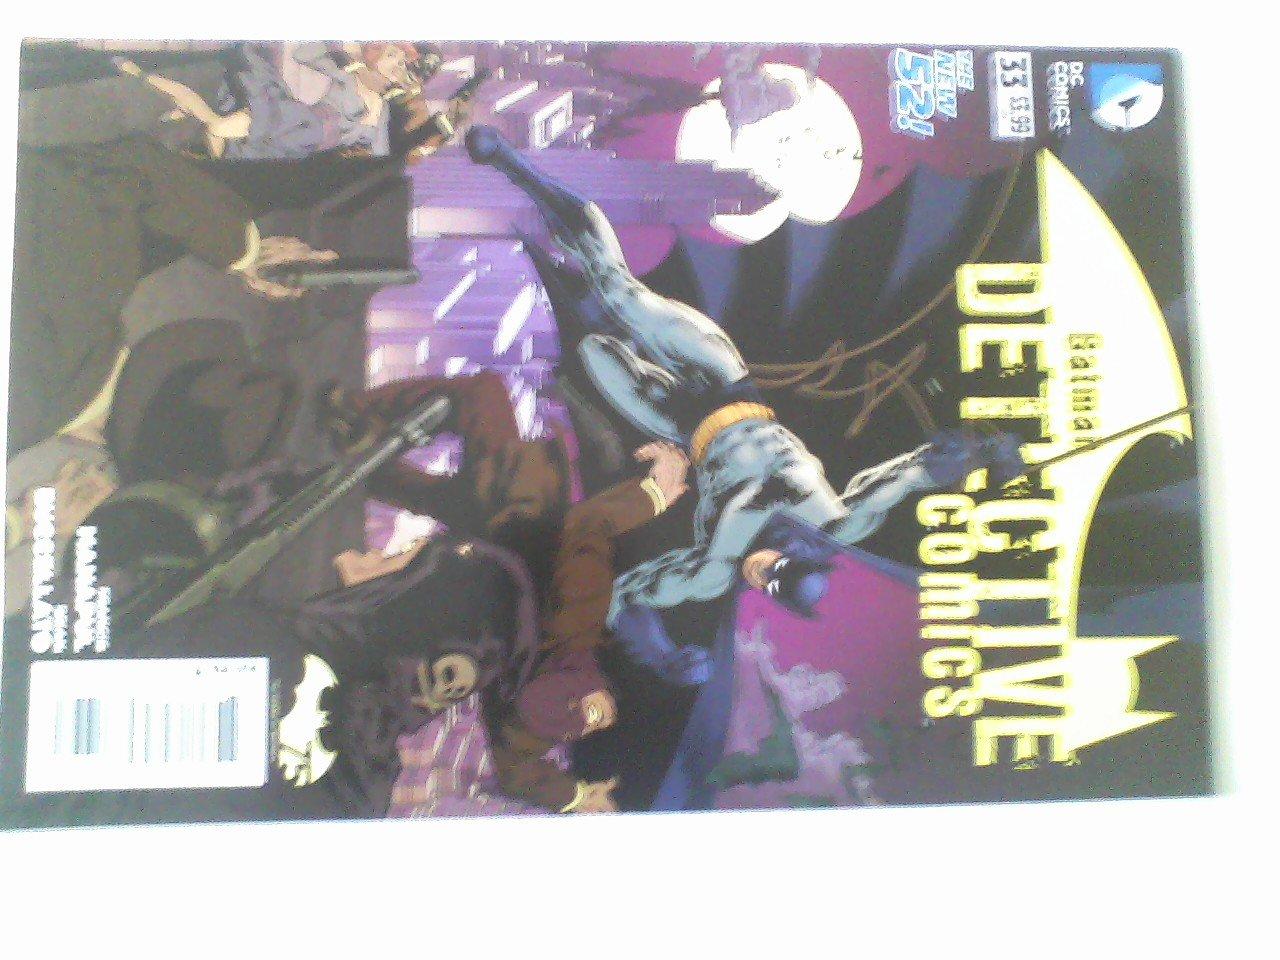 Detective Comics Vol 2 #33  Variant Jim Steranko Batman 75th Anniversary Cover